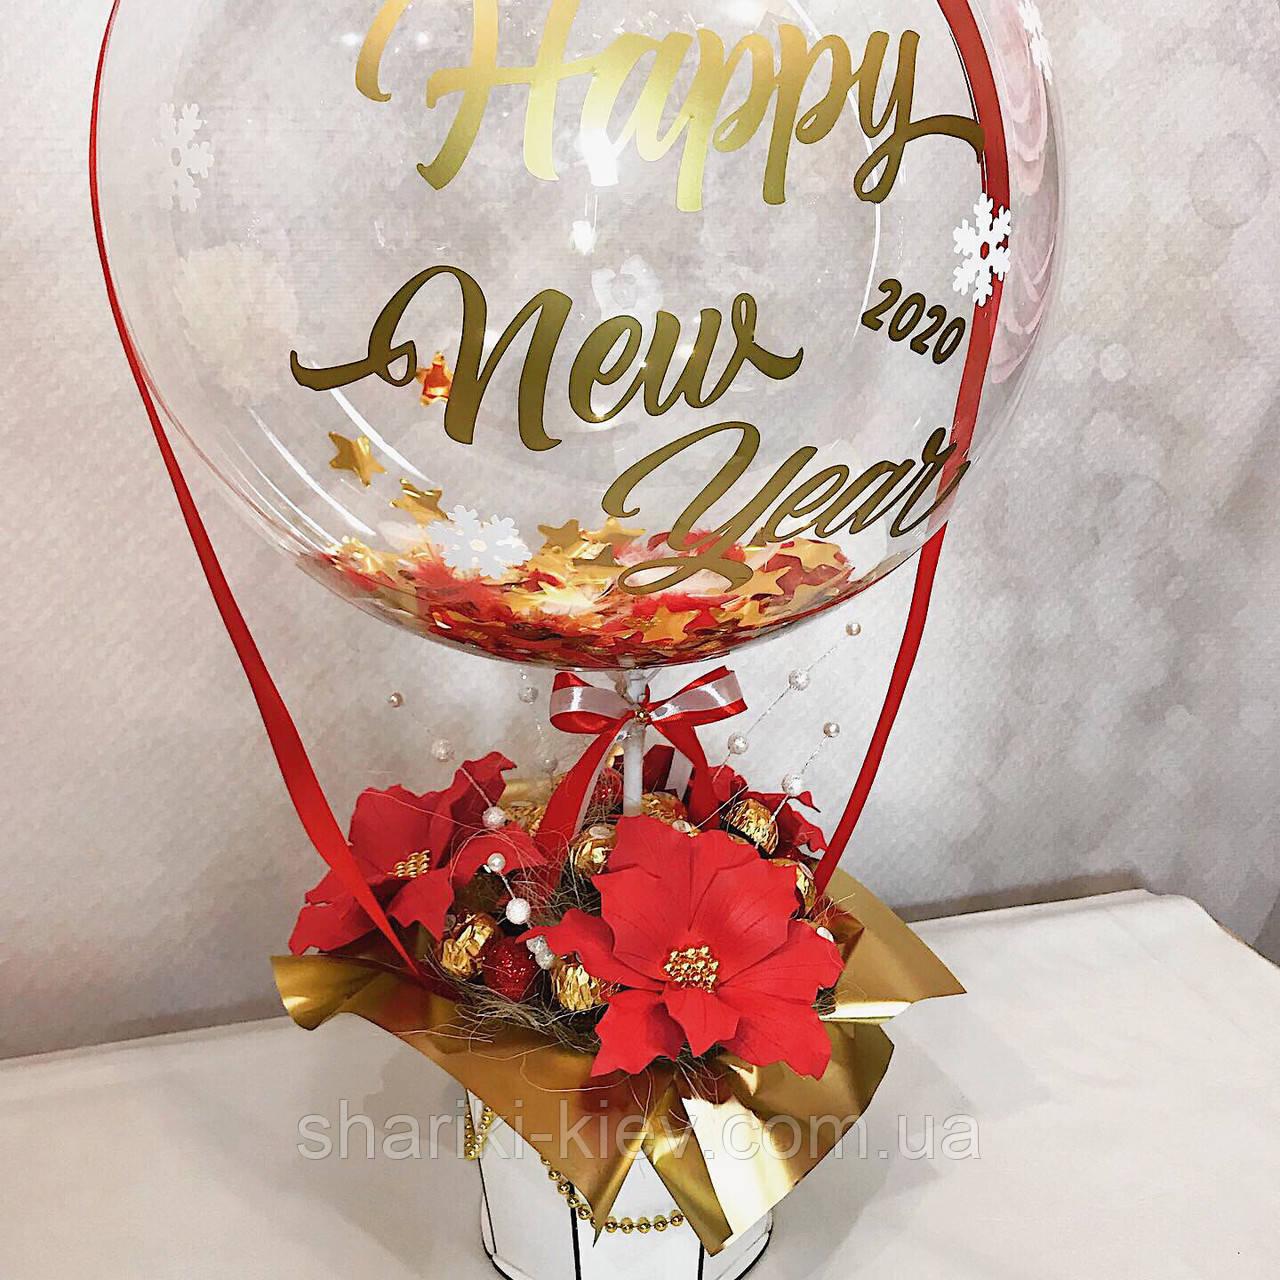 Новогодний подарок Sweet Air Box Сладкая коробка воздушный шар